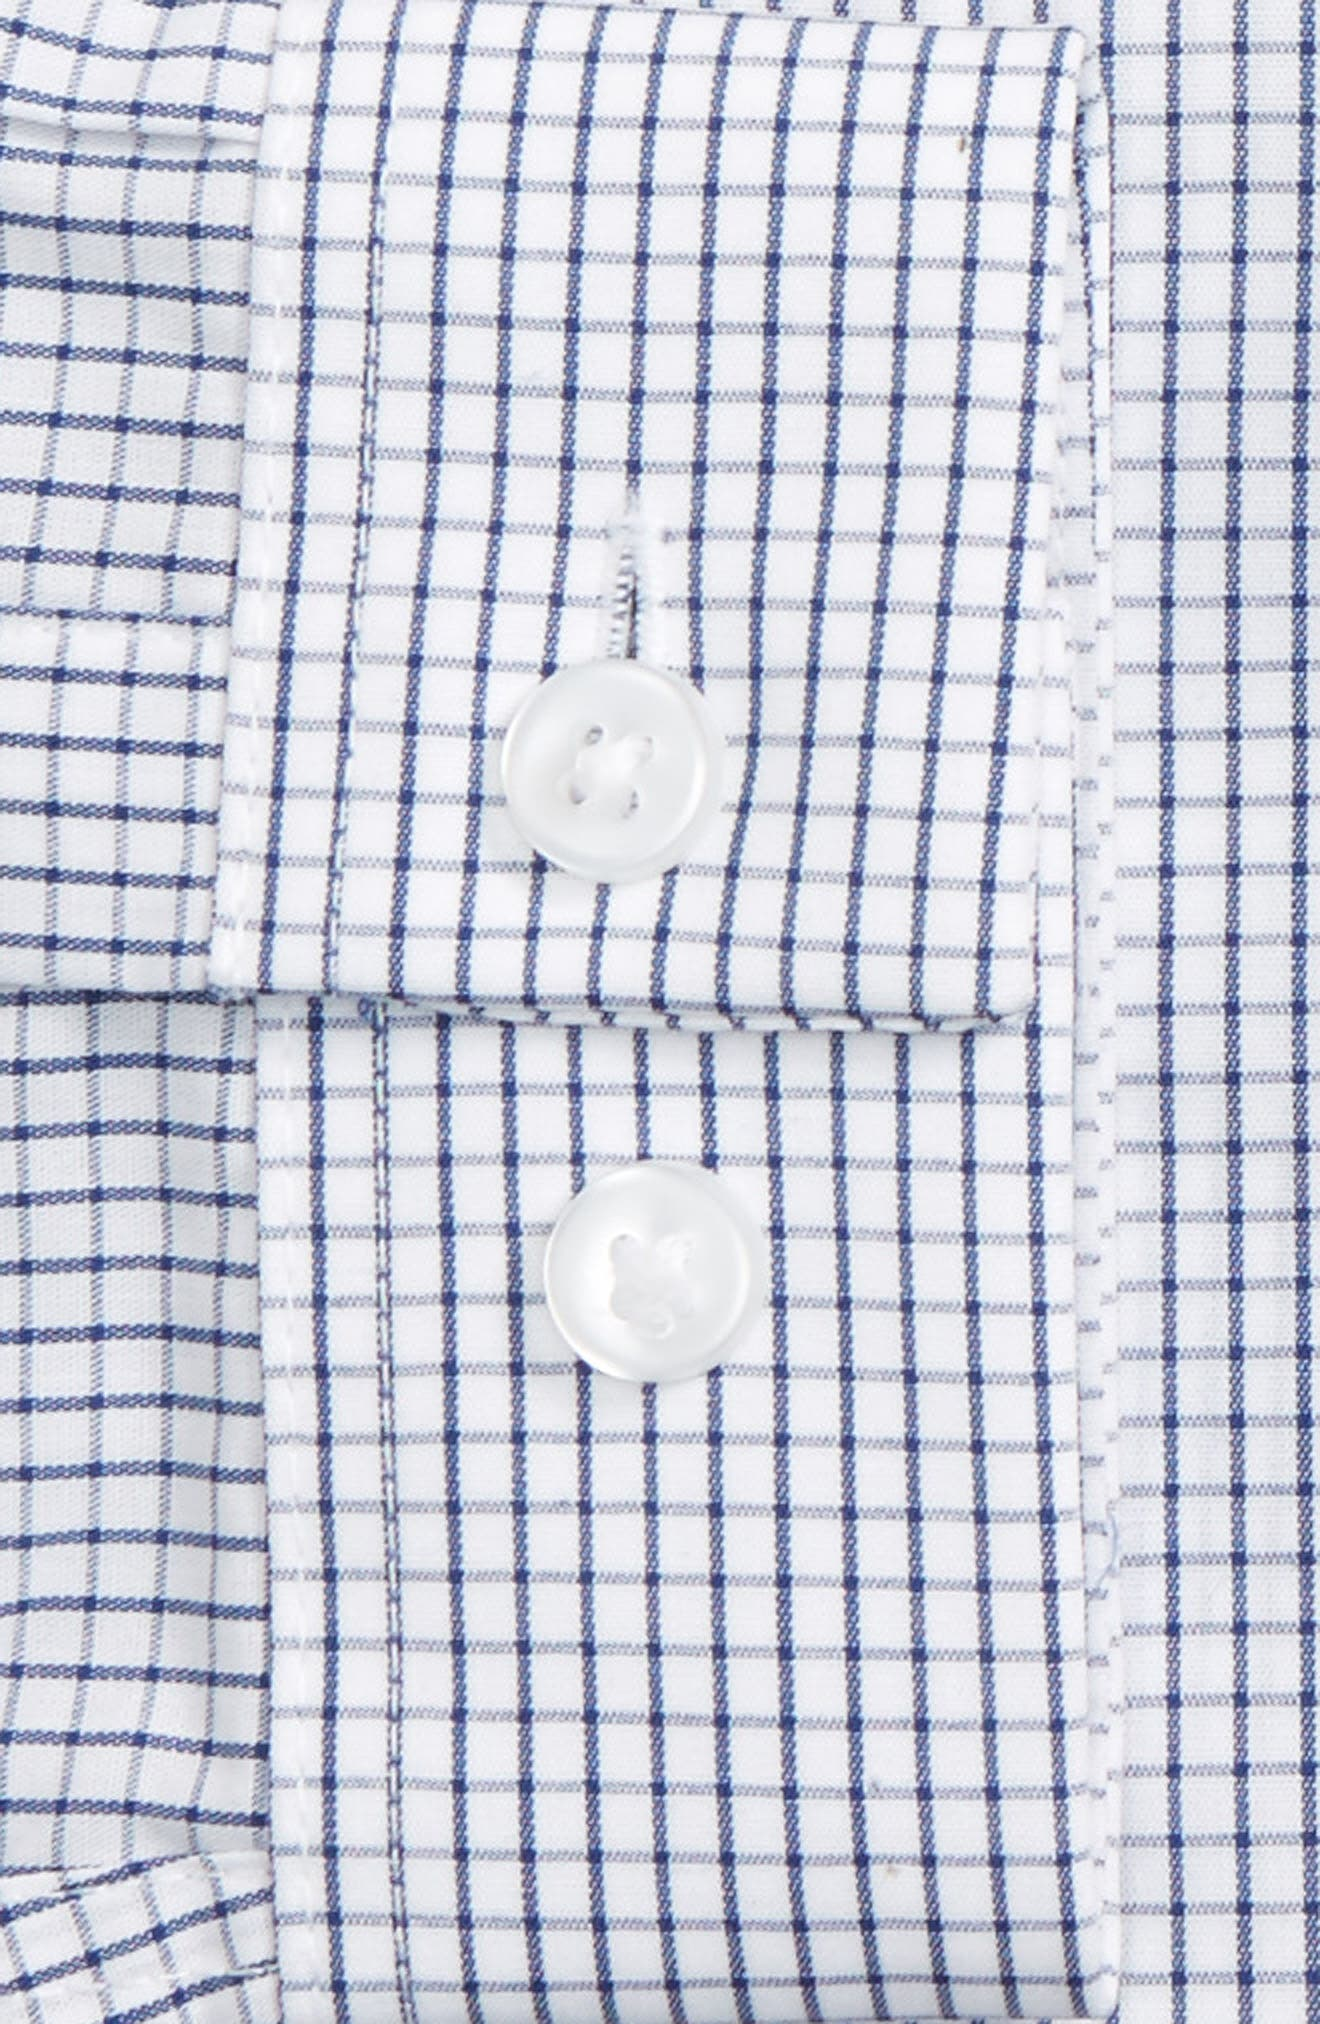 Slim Fit Grid Check Dress Shirt,                             Alternate thumbnail 4, color,                             102